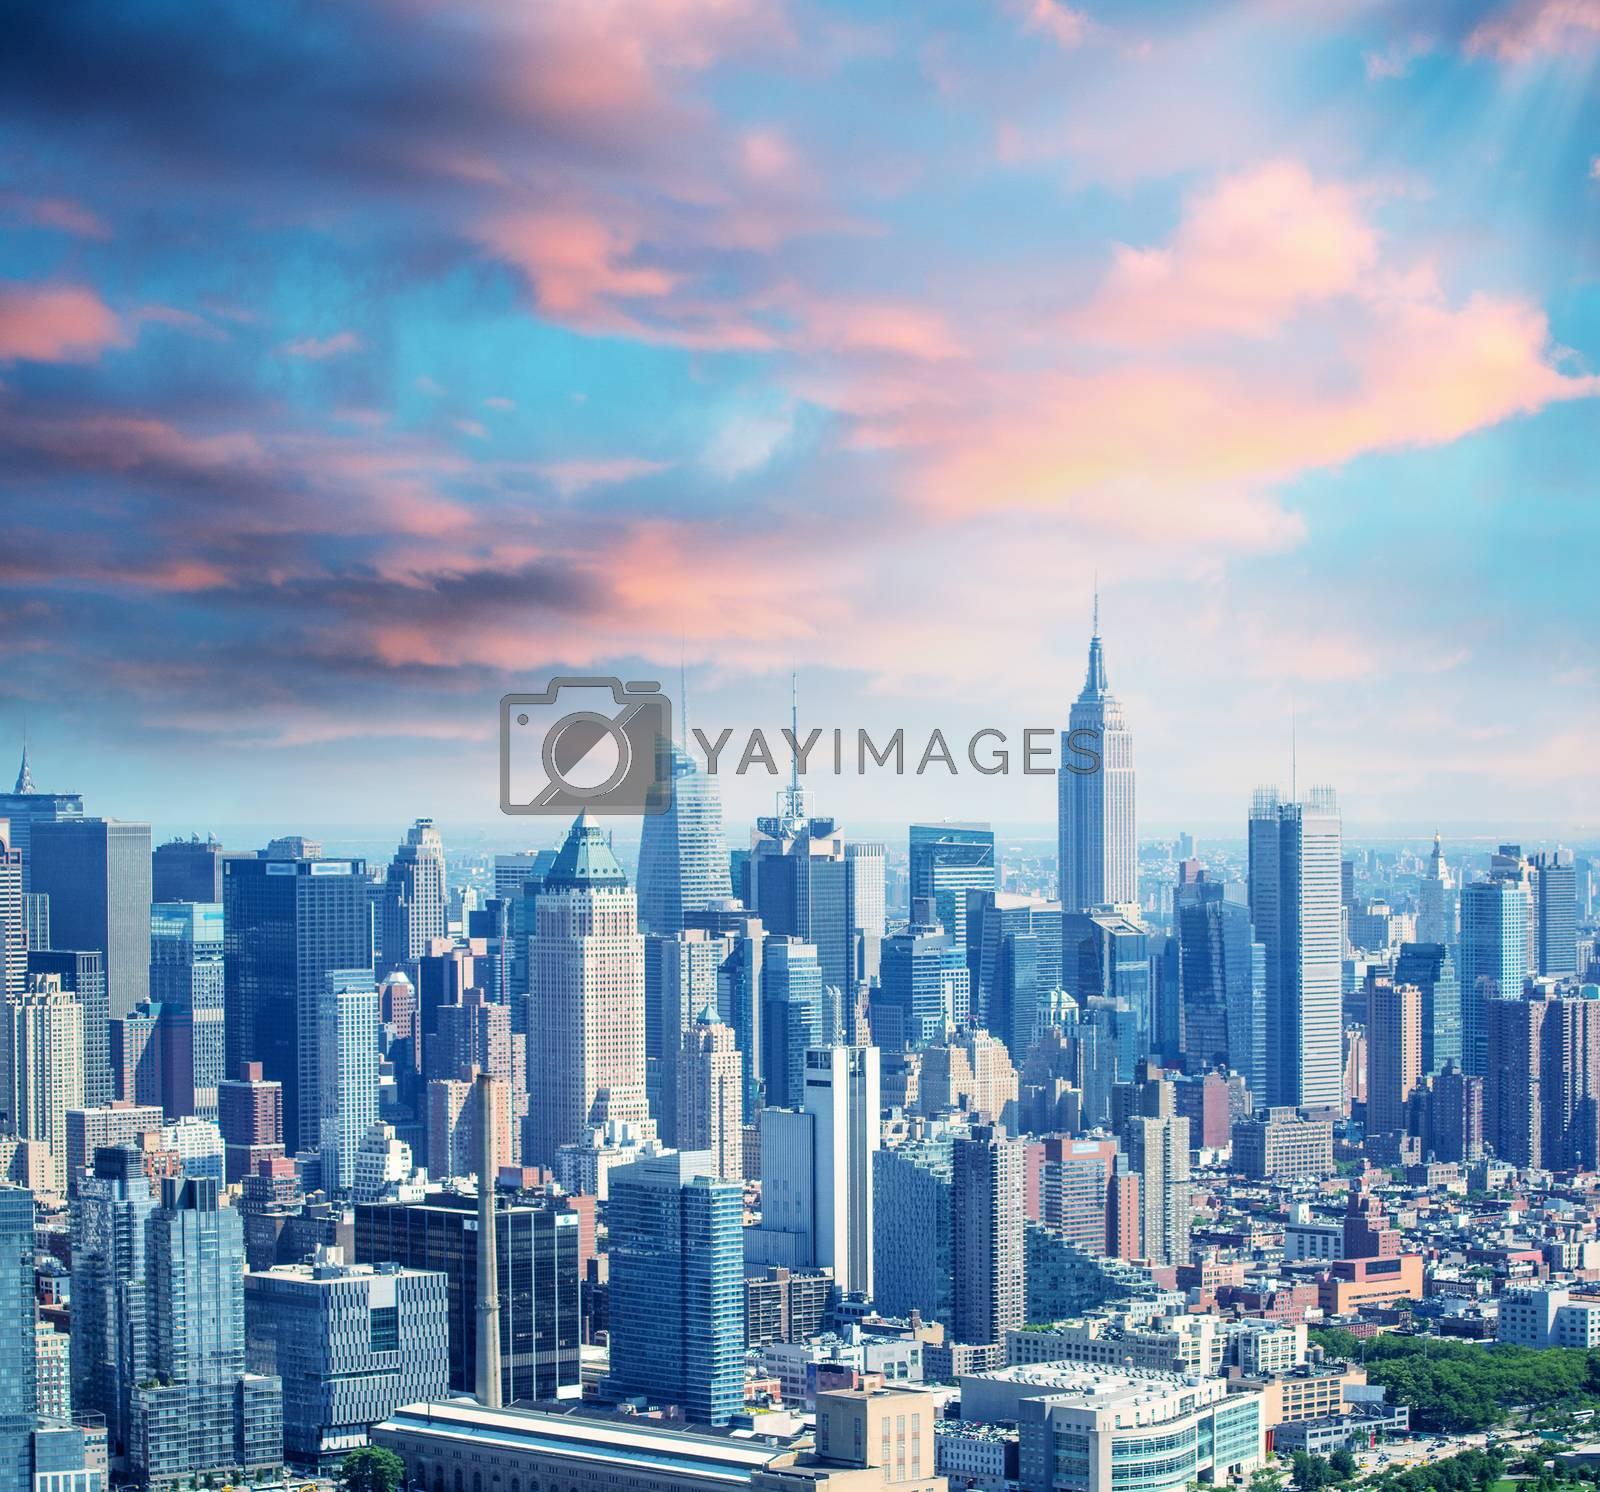 New York skyline by jovannig